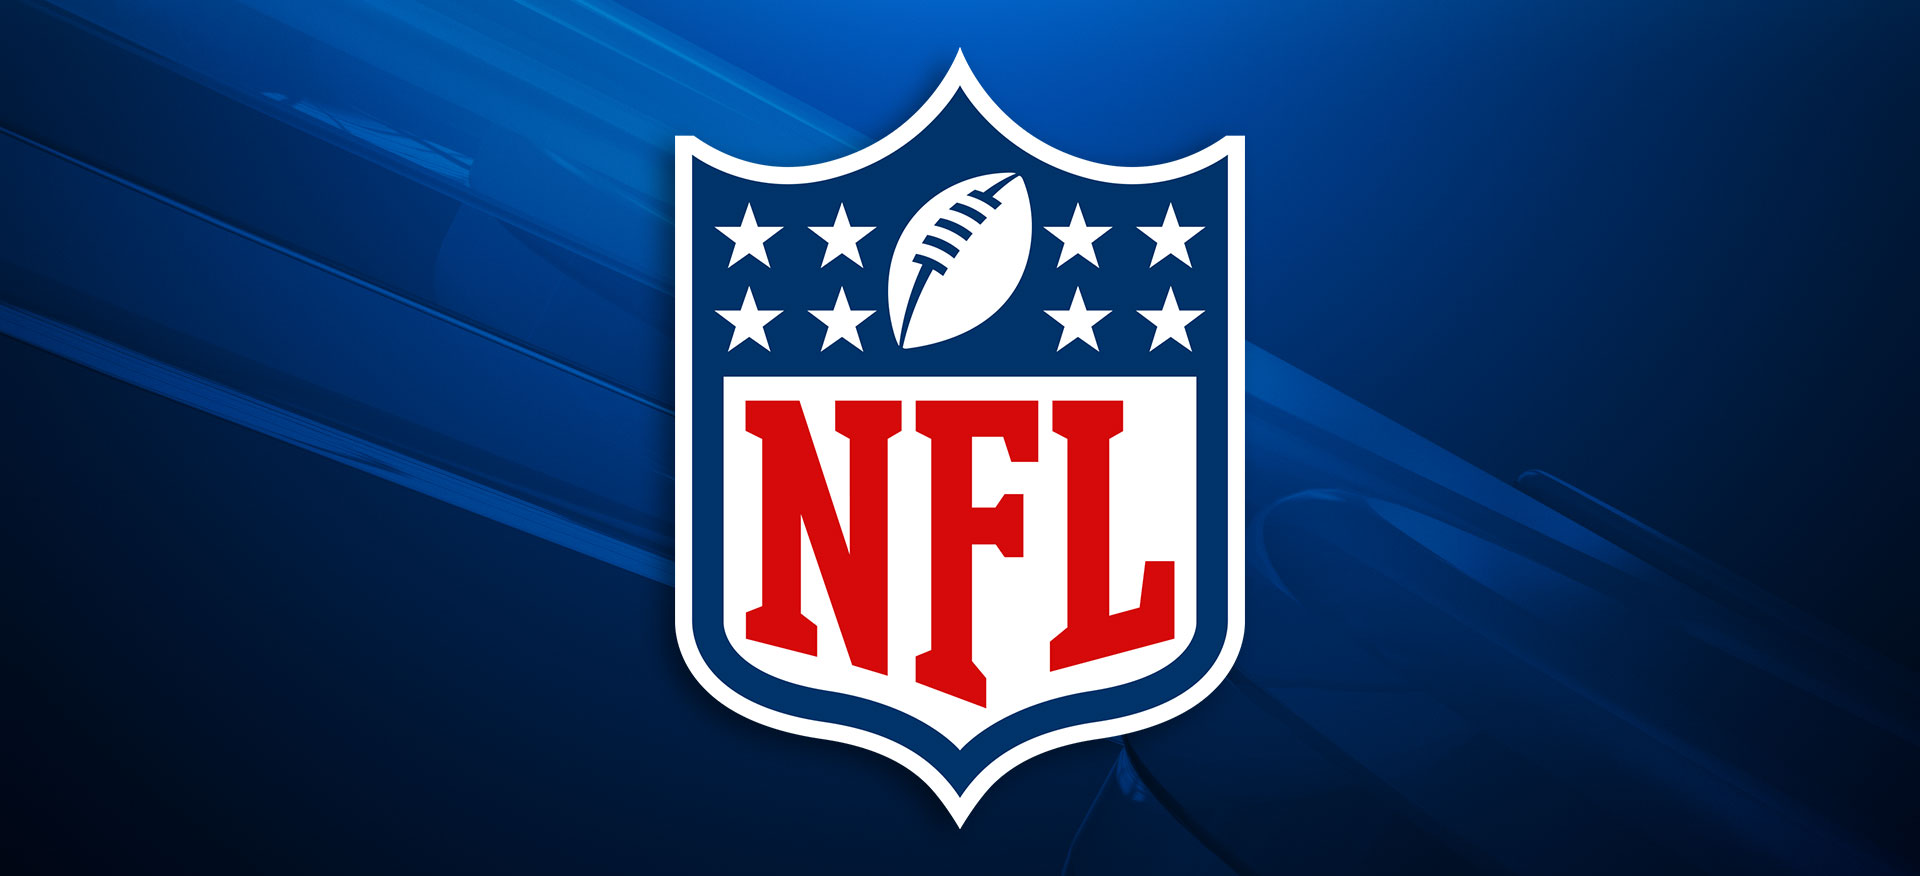 NFL Logo National Football League